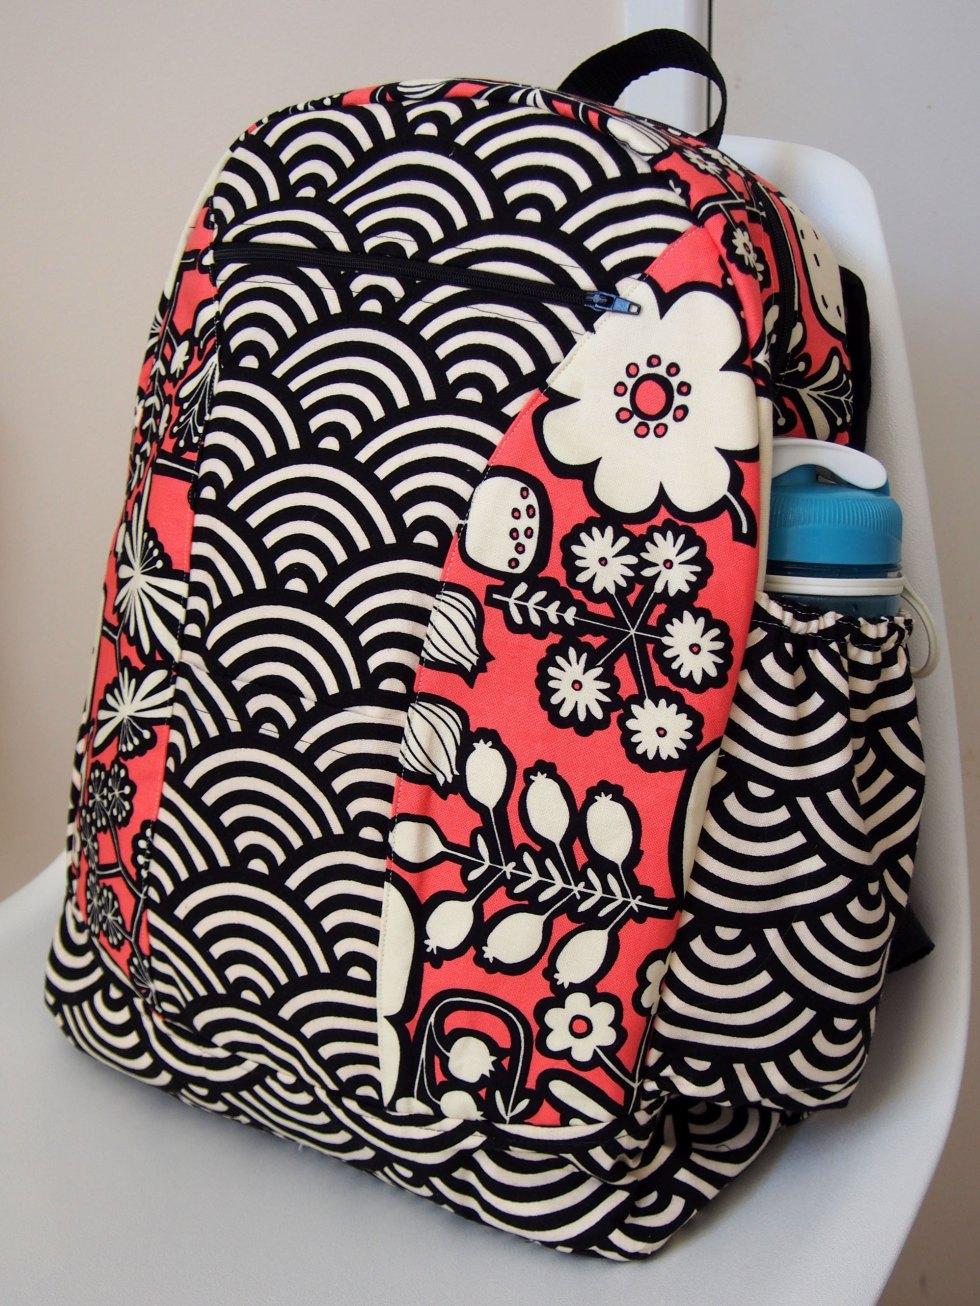 Completed Bazinga backpack